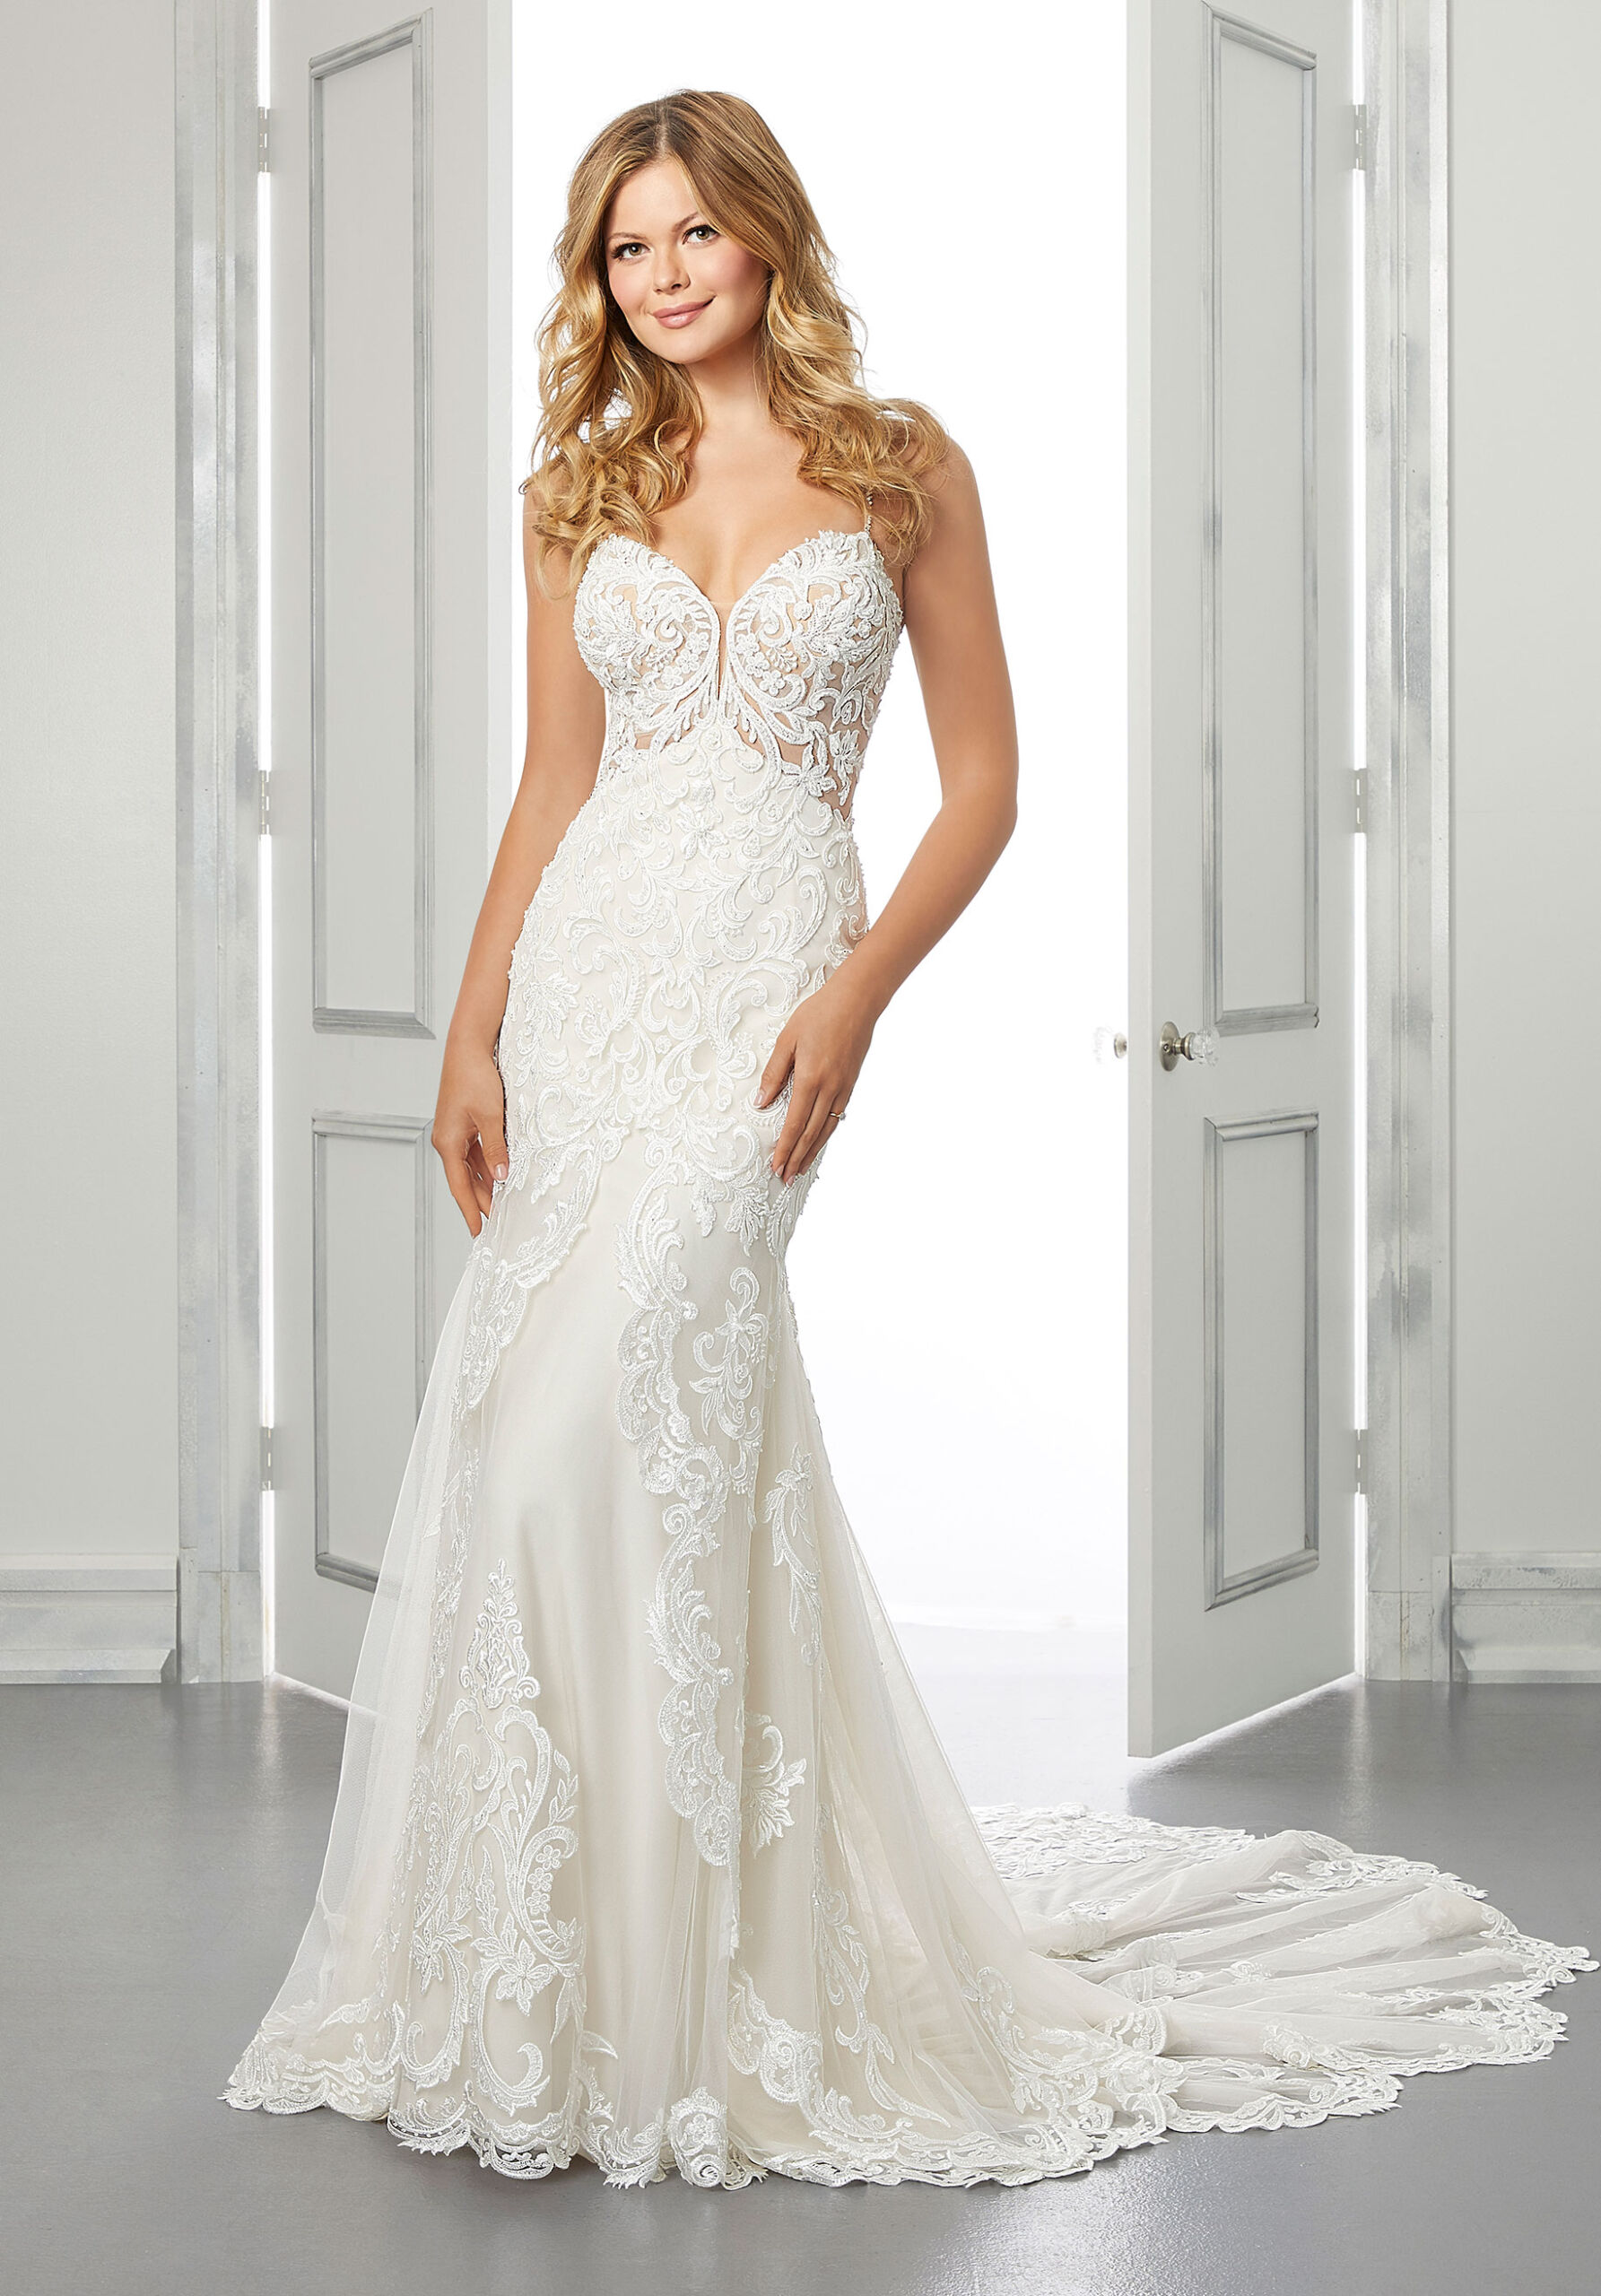 Bridal Factory Outlet Up To 70 Off All Designer Wedding Dresses